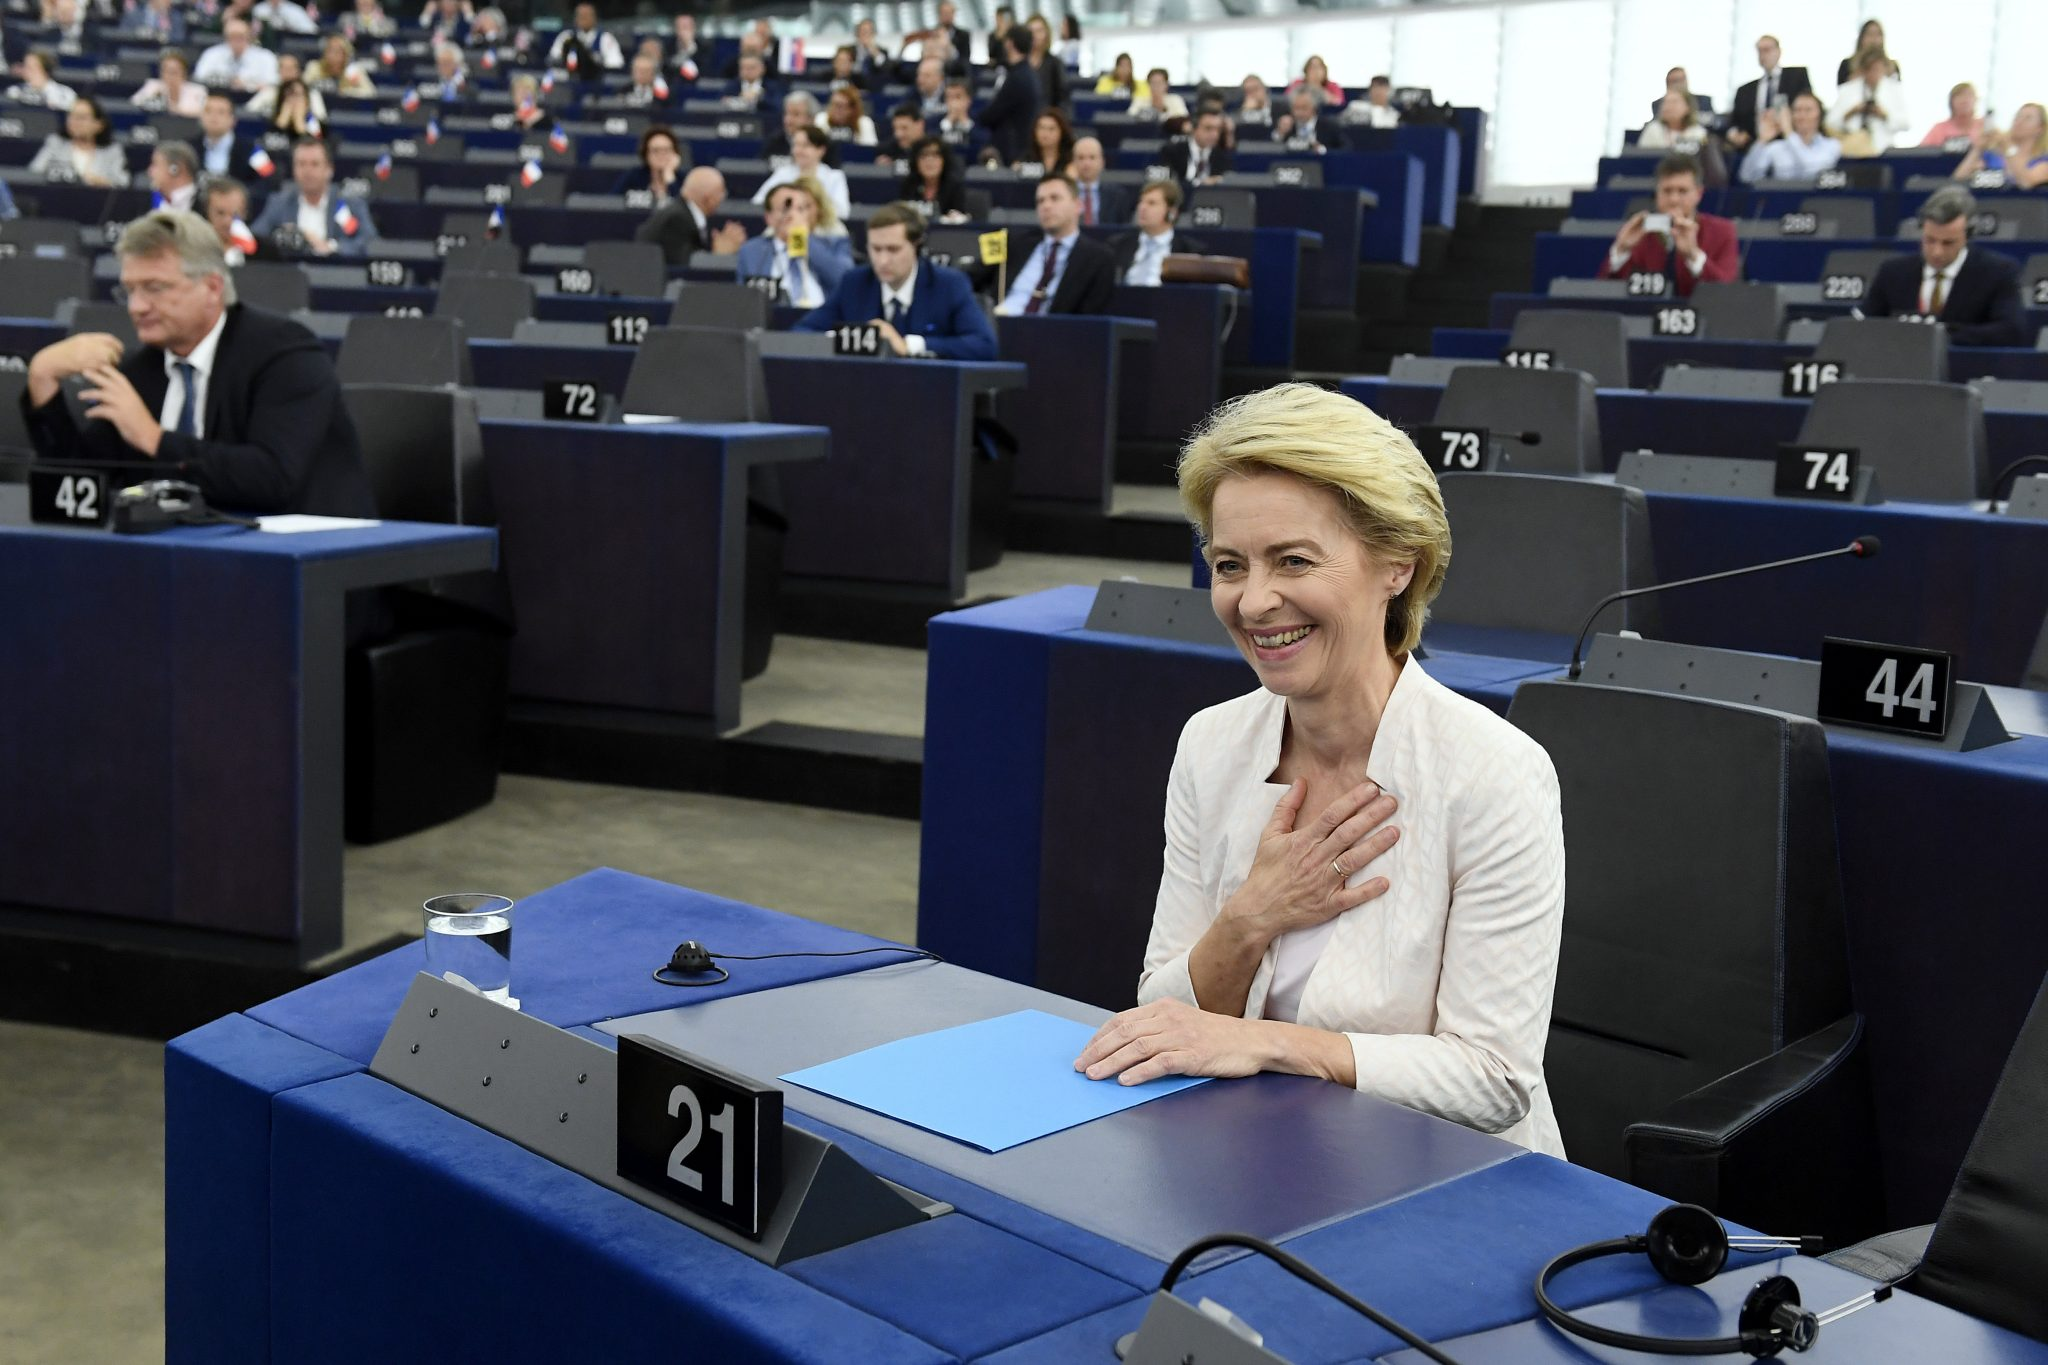 Ursula von der Leyen Elected European Commission President post's picture